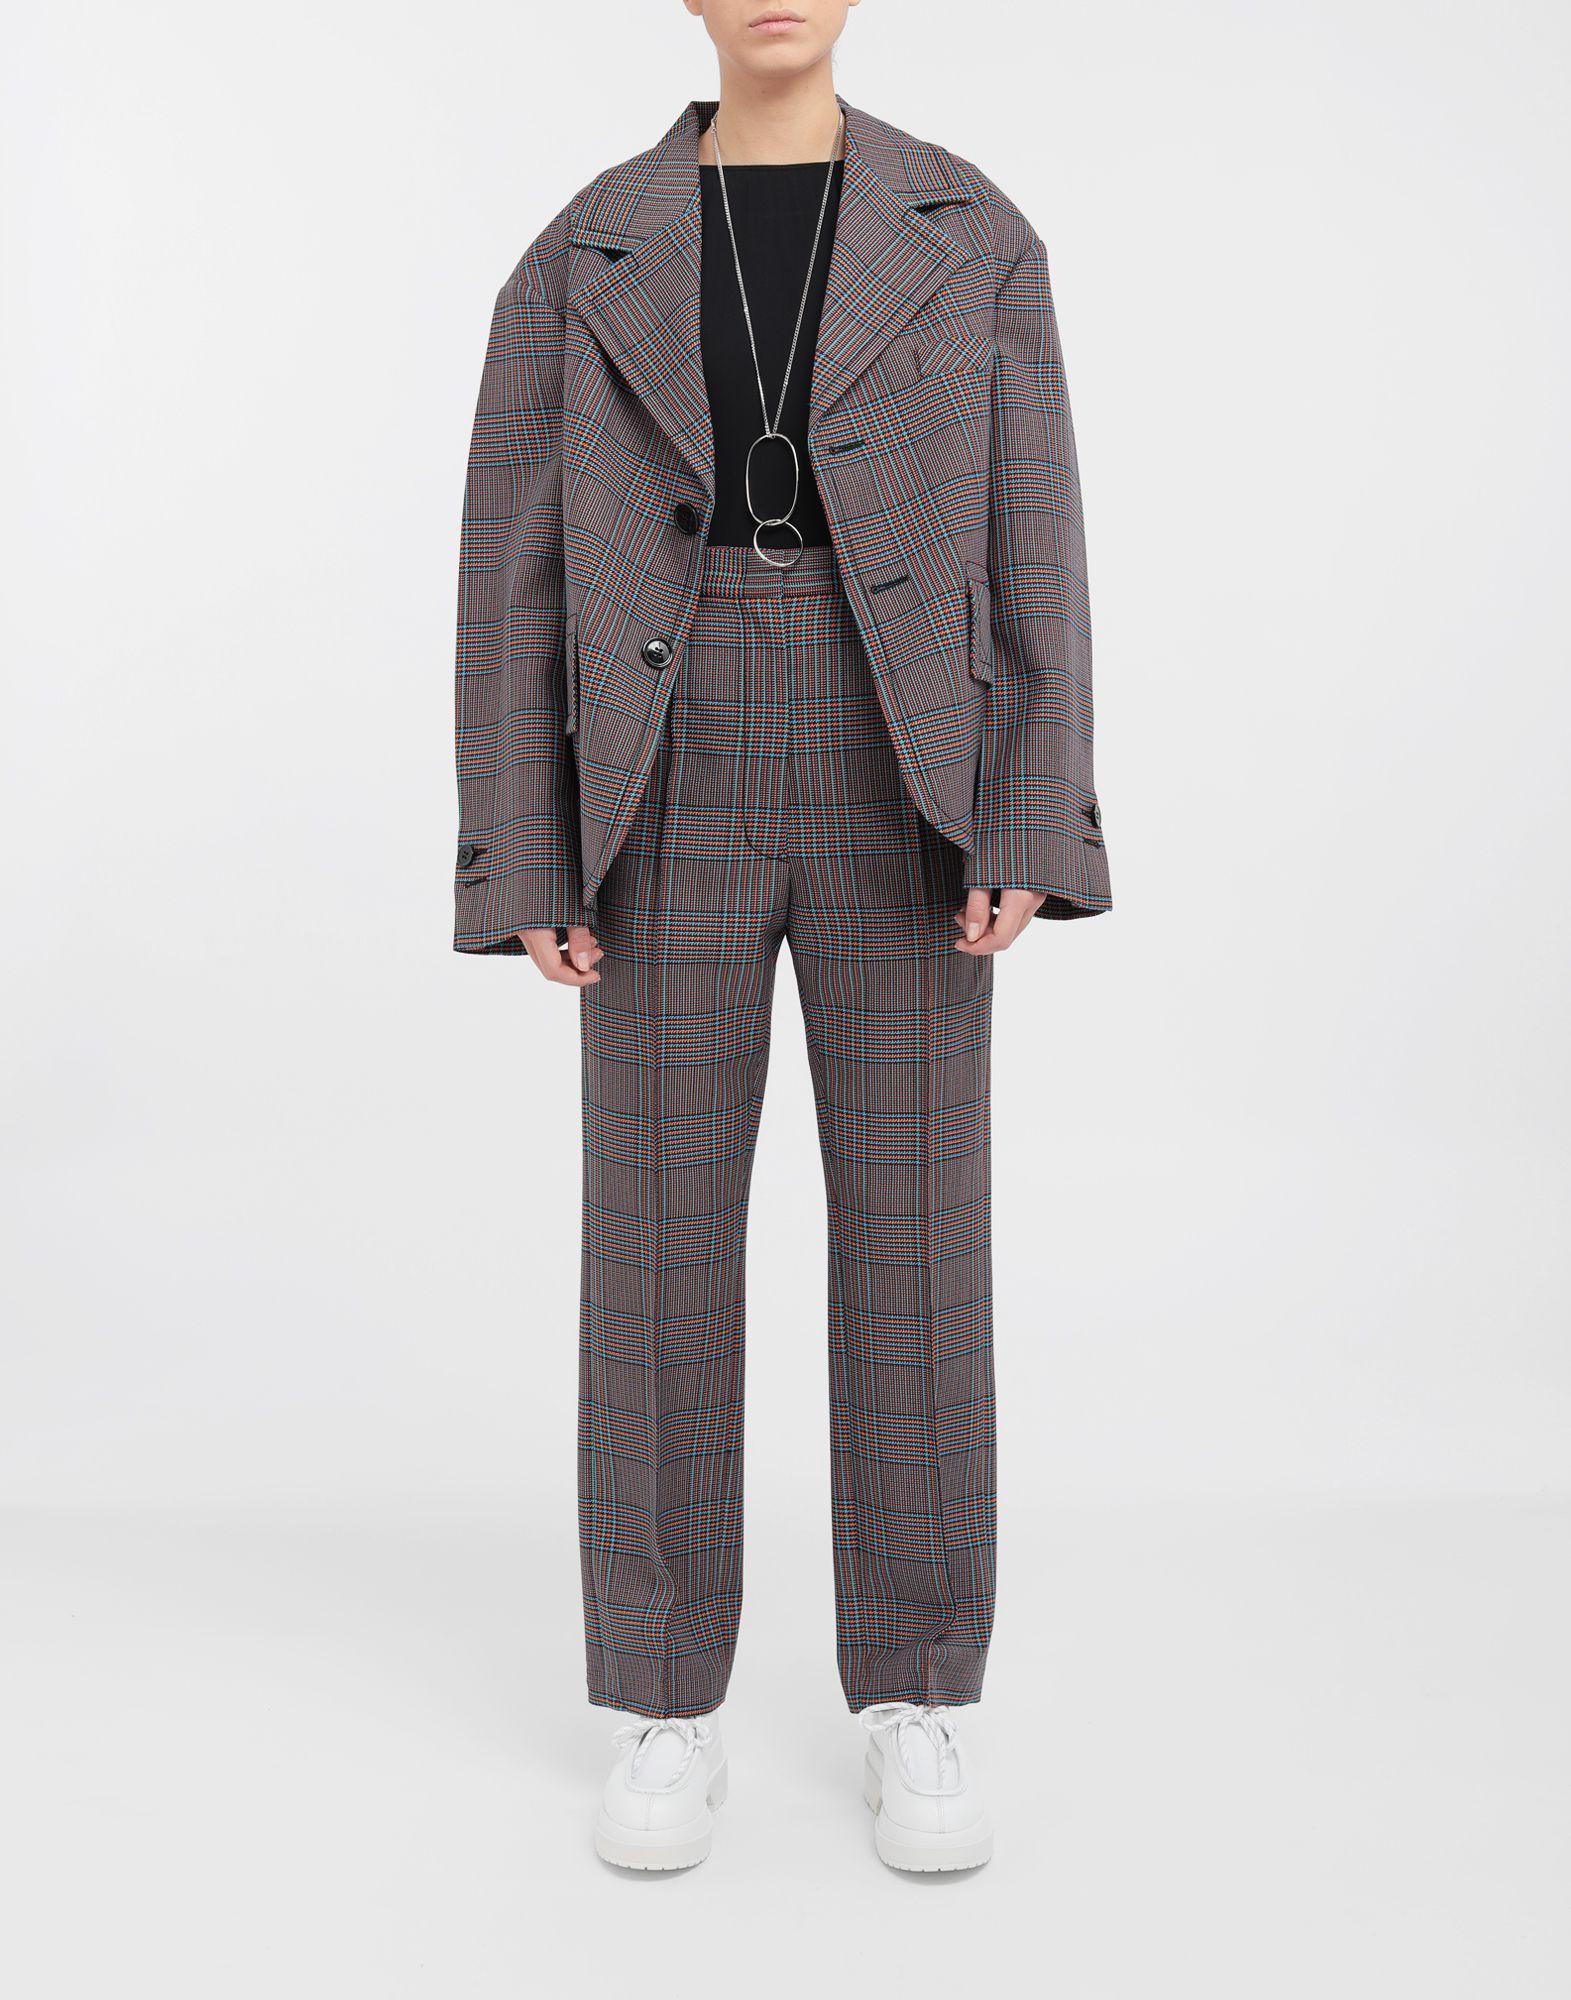 MM6 MAISON MARGIELA Oversized checked wool jacket Jacket Woman d